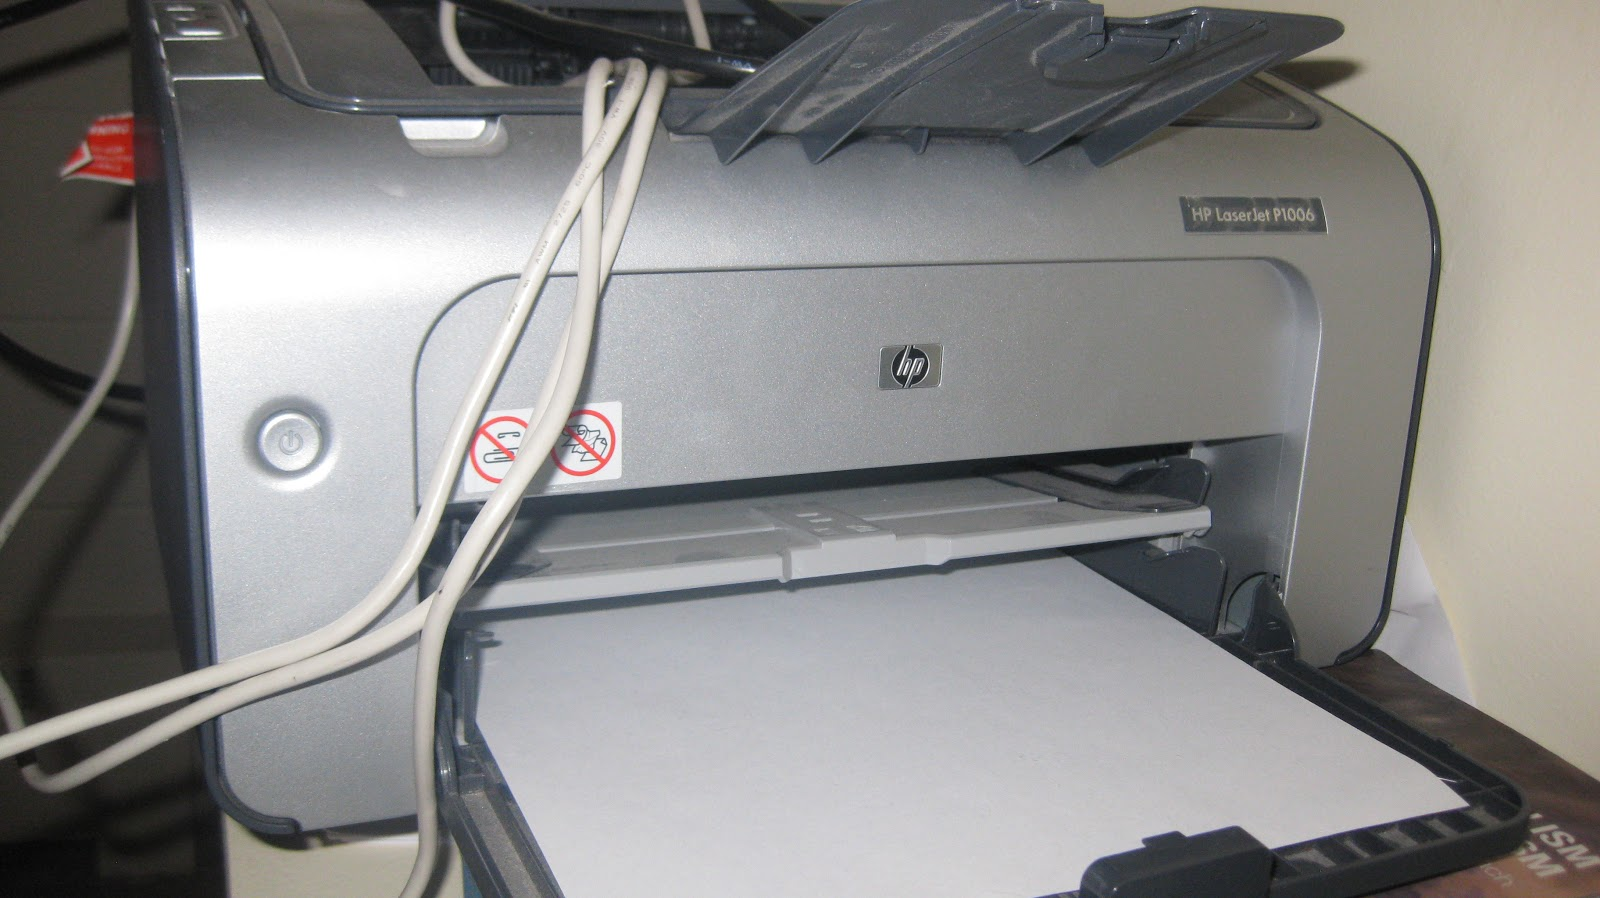 Hp Laserjet P1006 Windows 10 64 Bit Driver